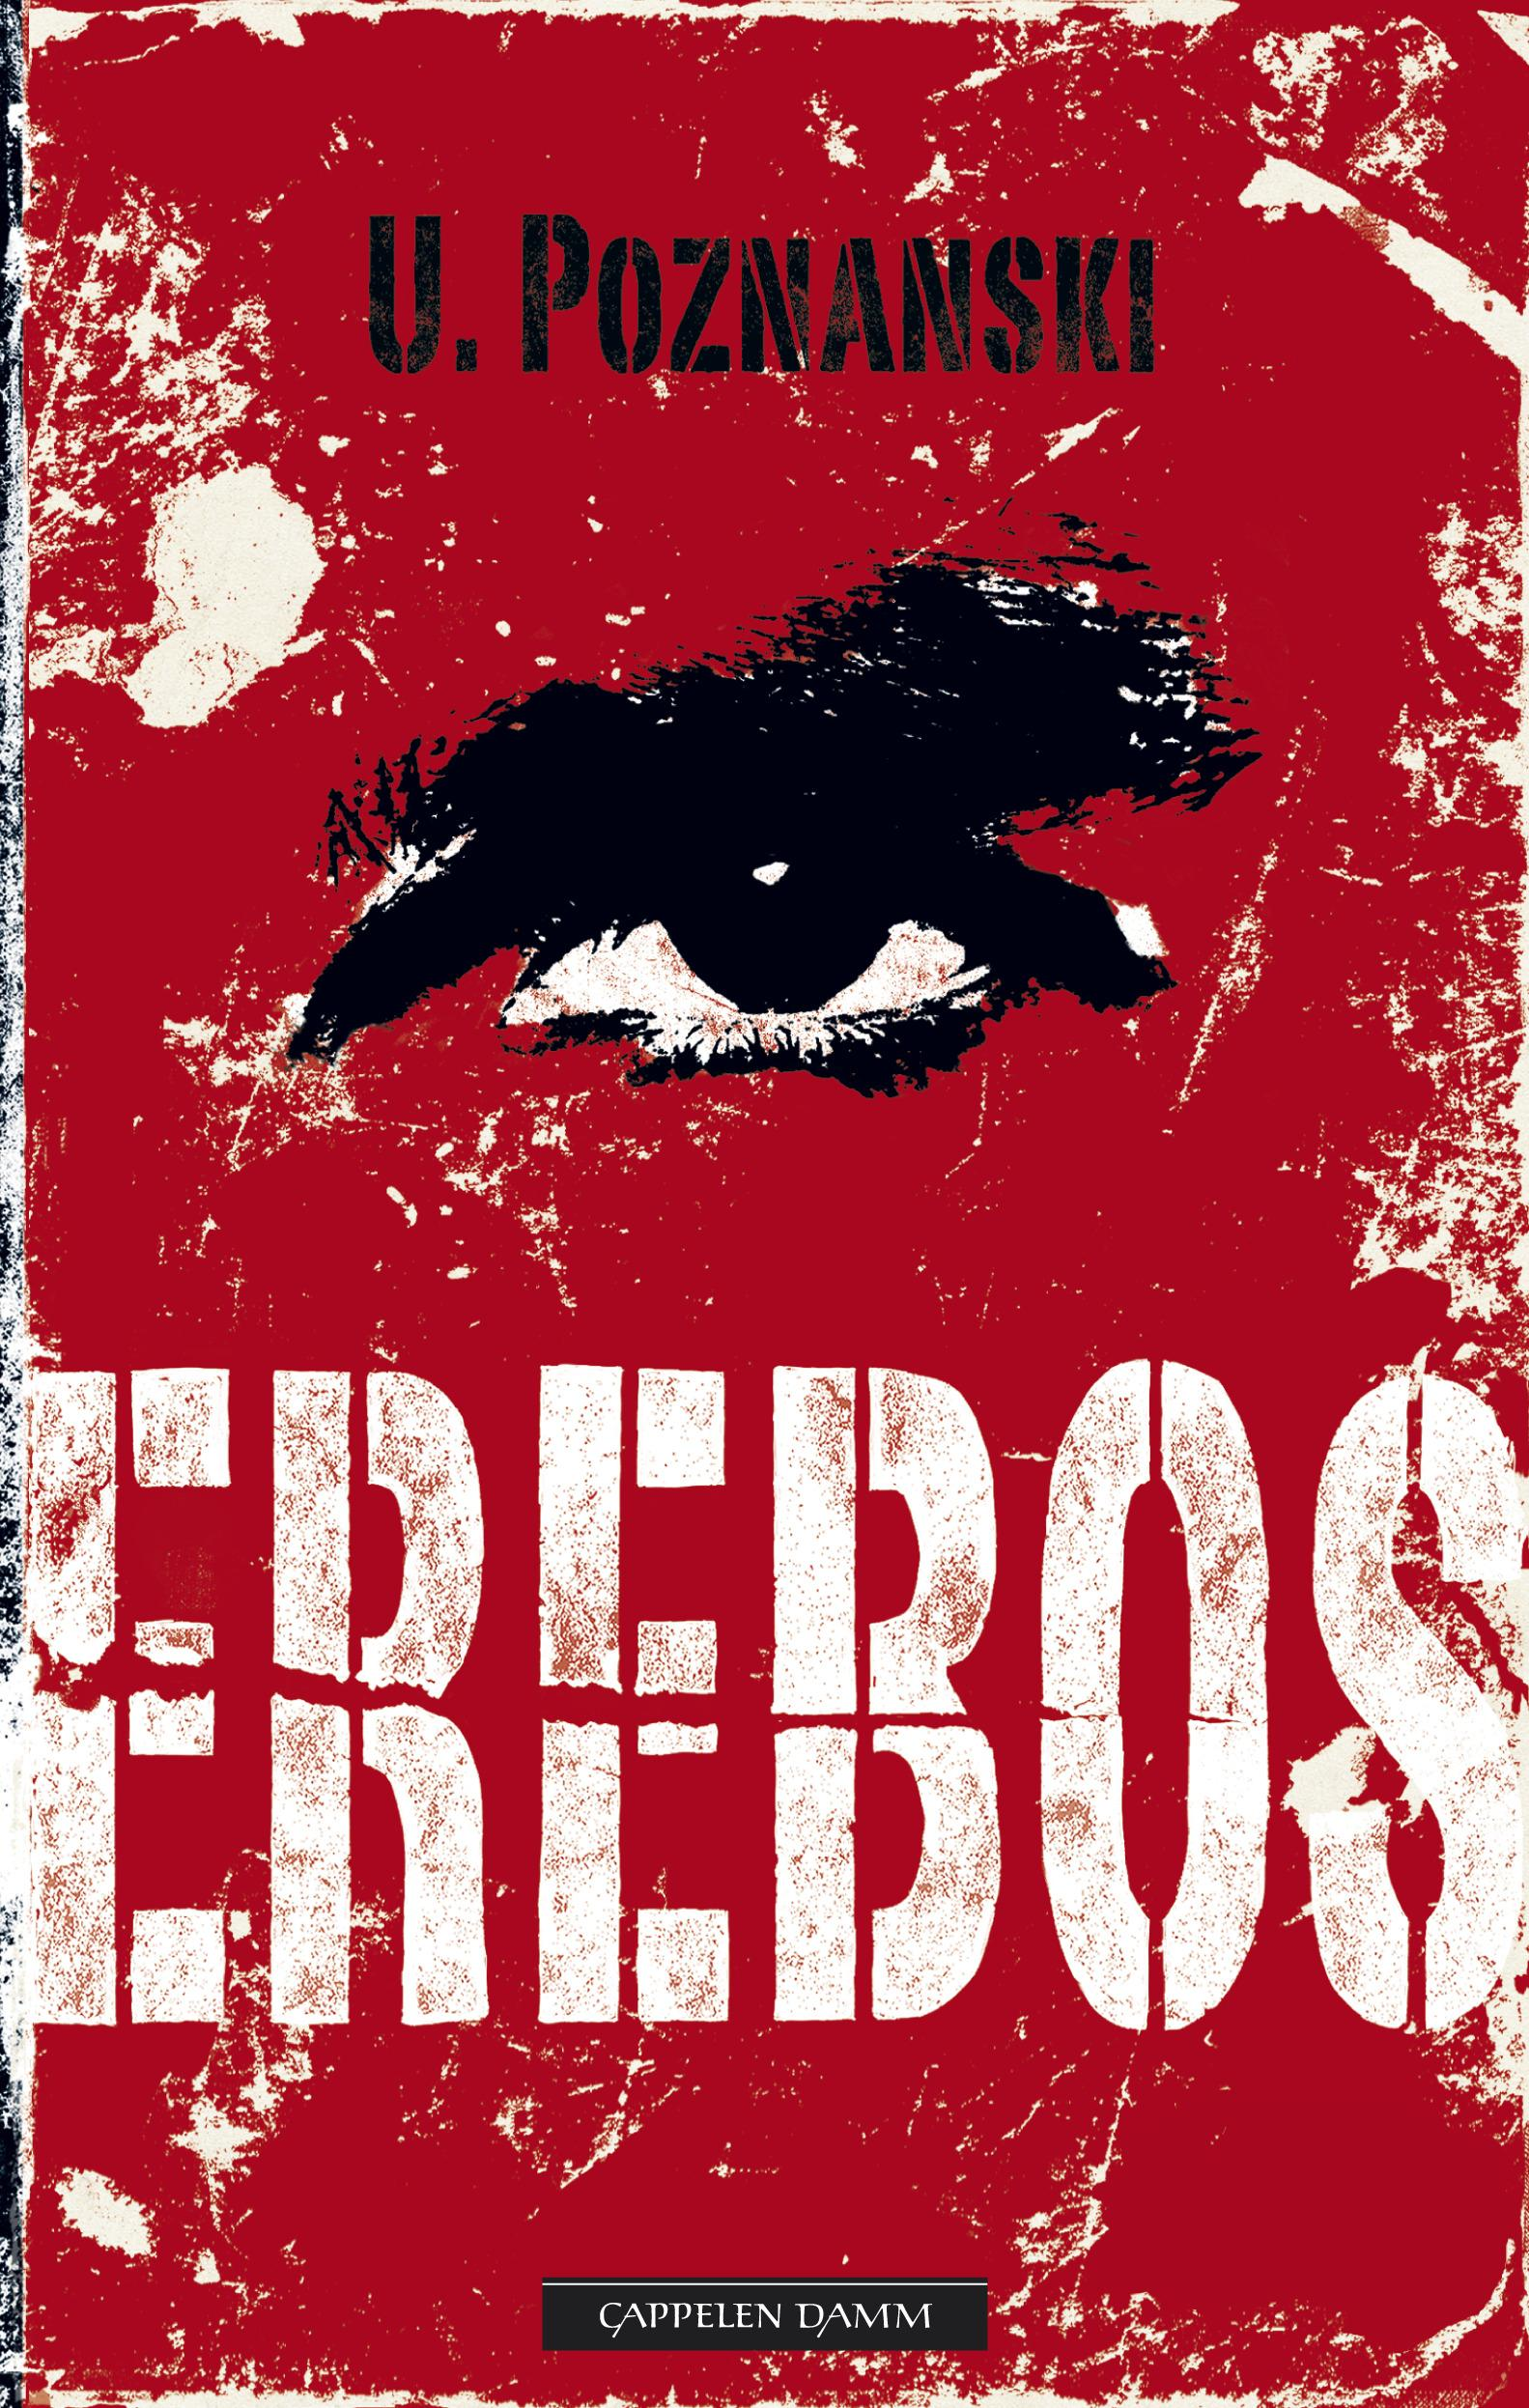 erebos by ursula poznanski.jpg